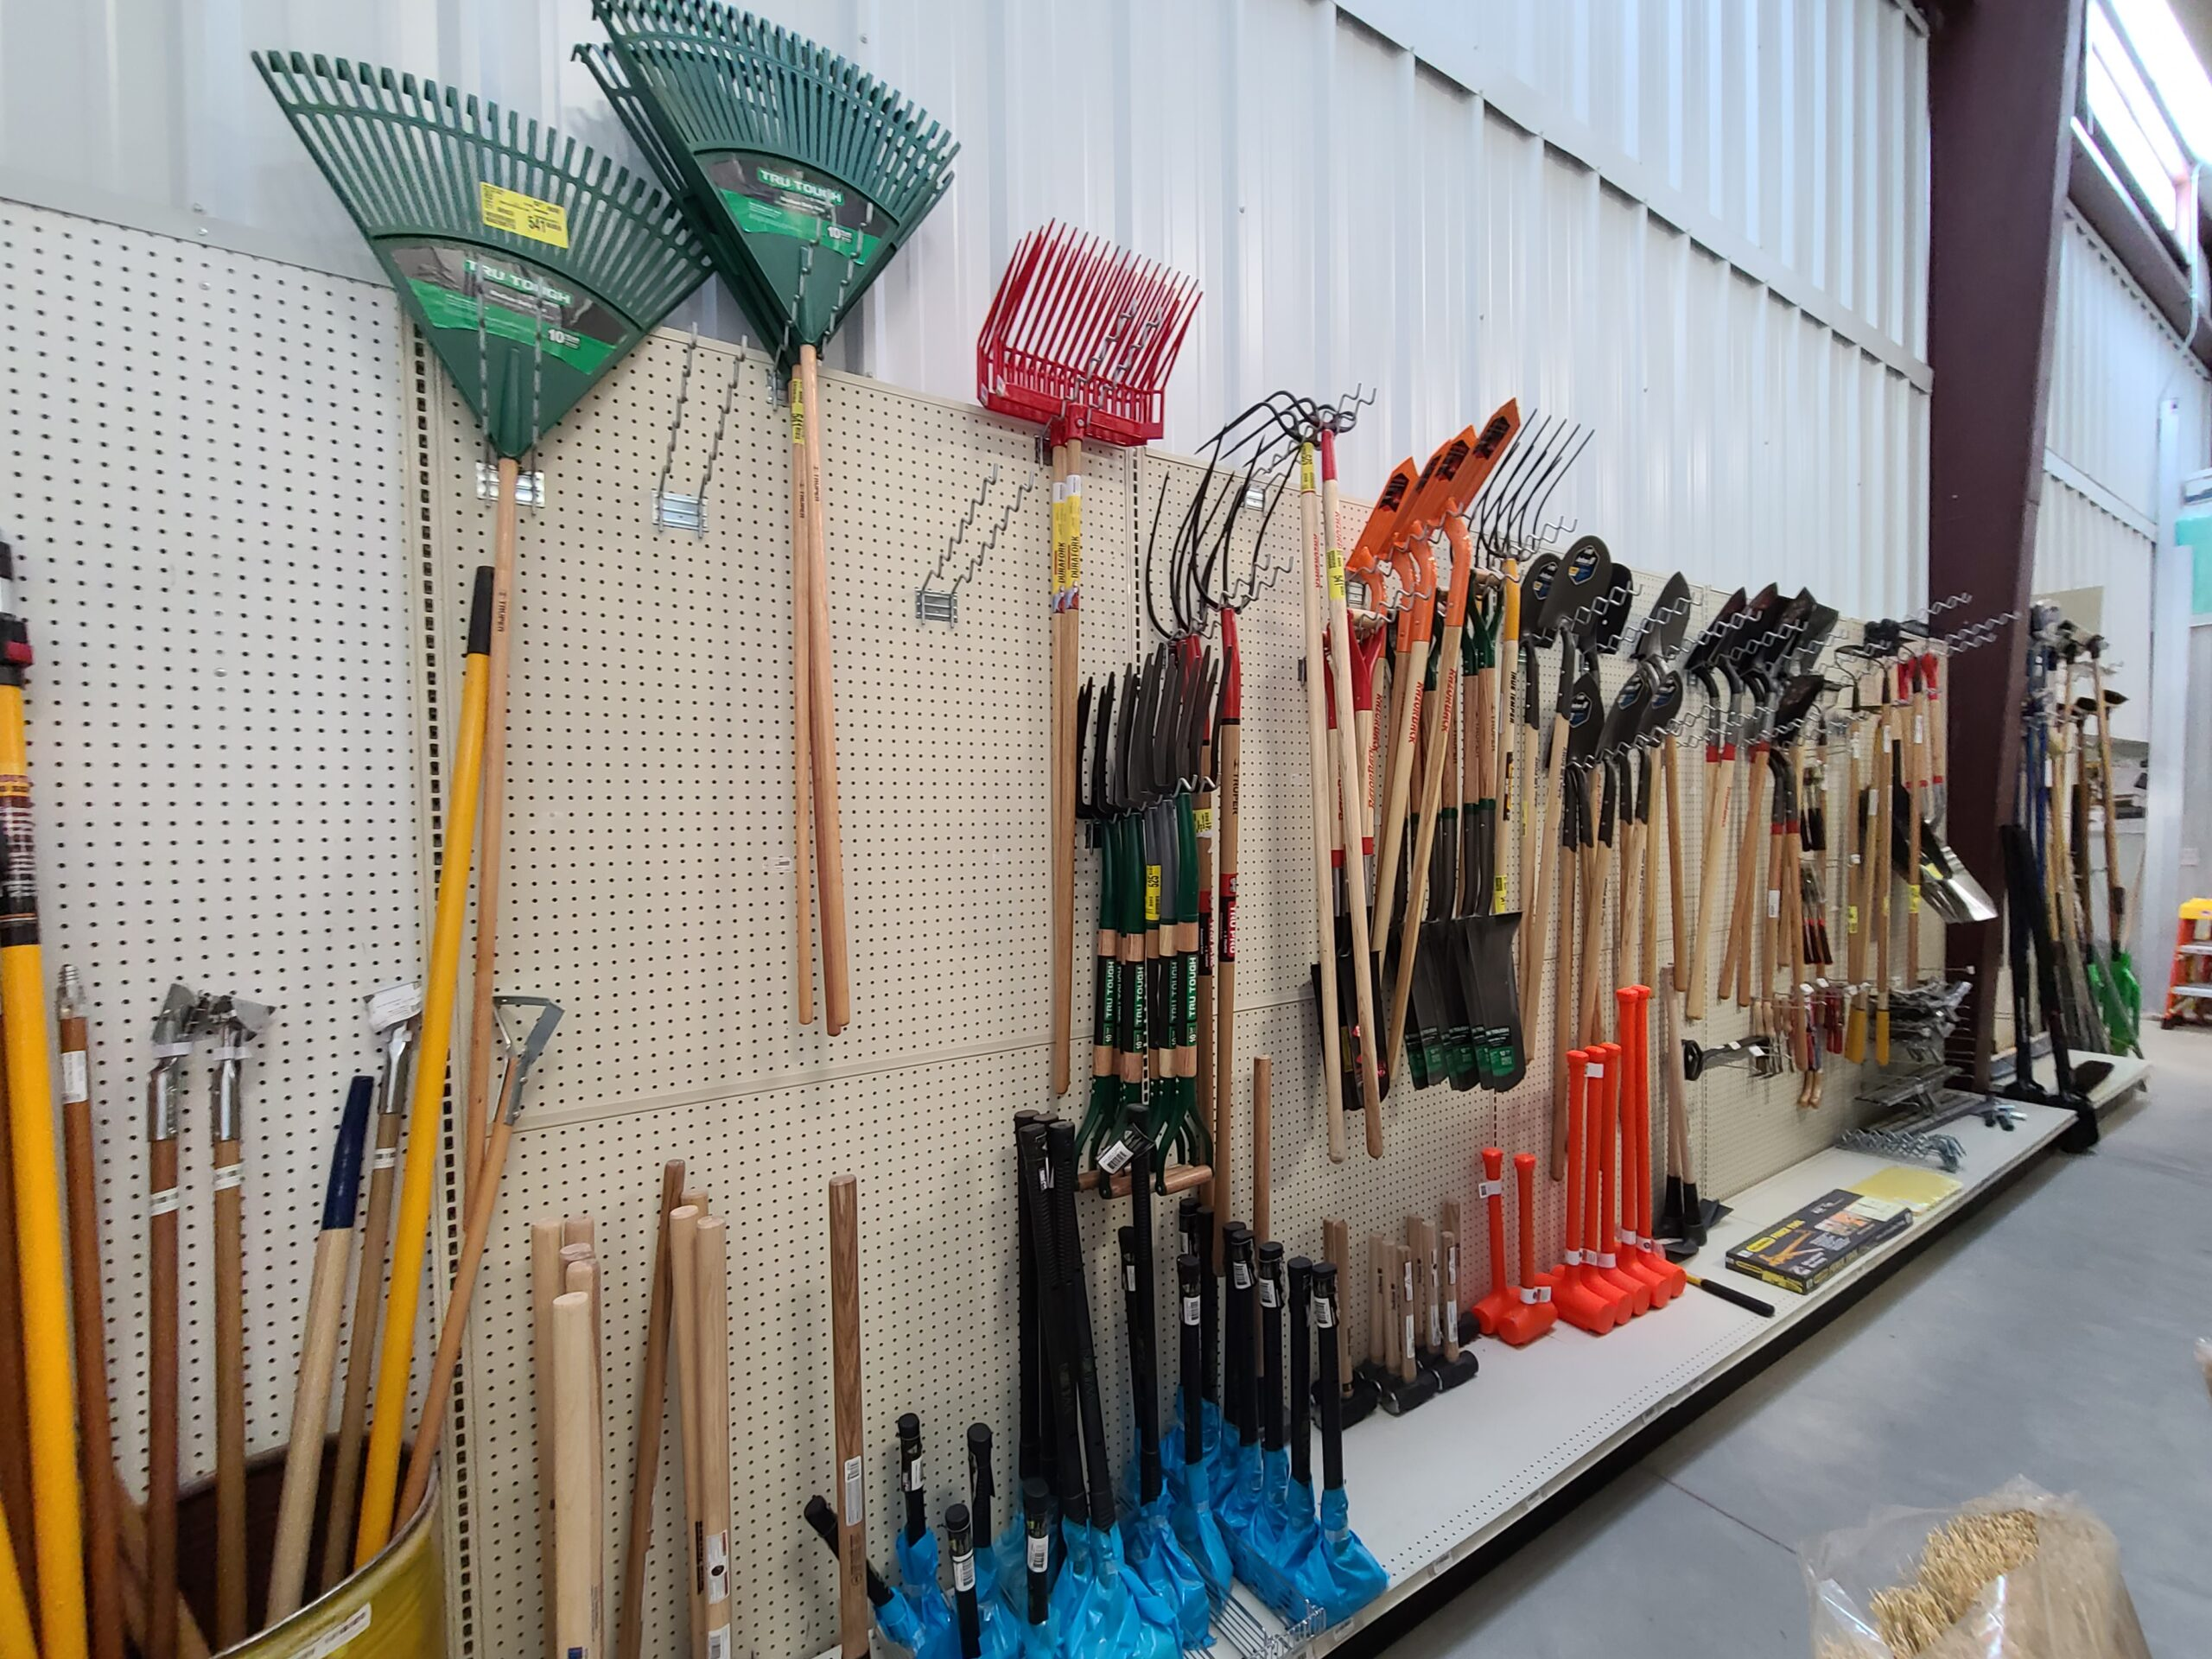 warehouse supply in LaSalle service